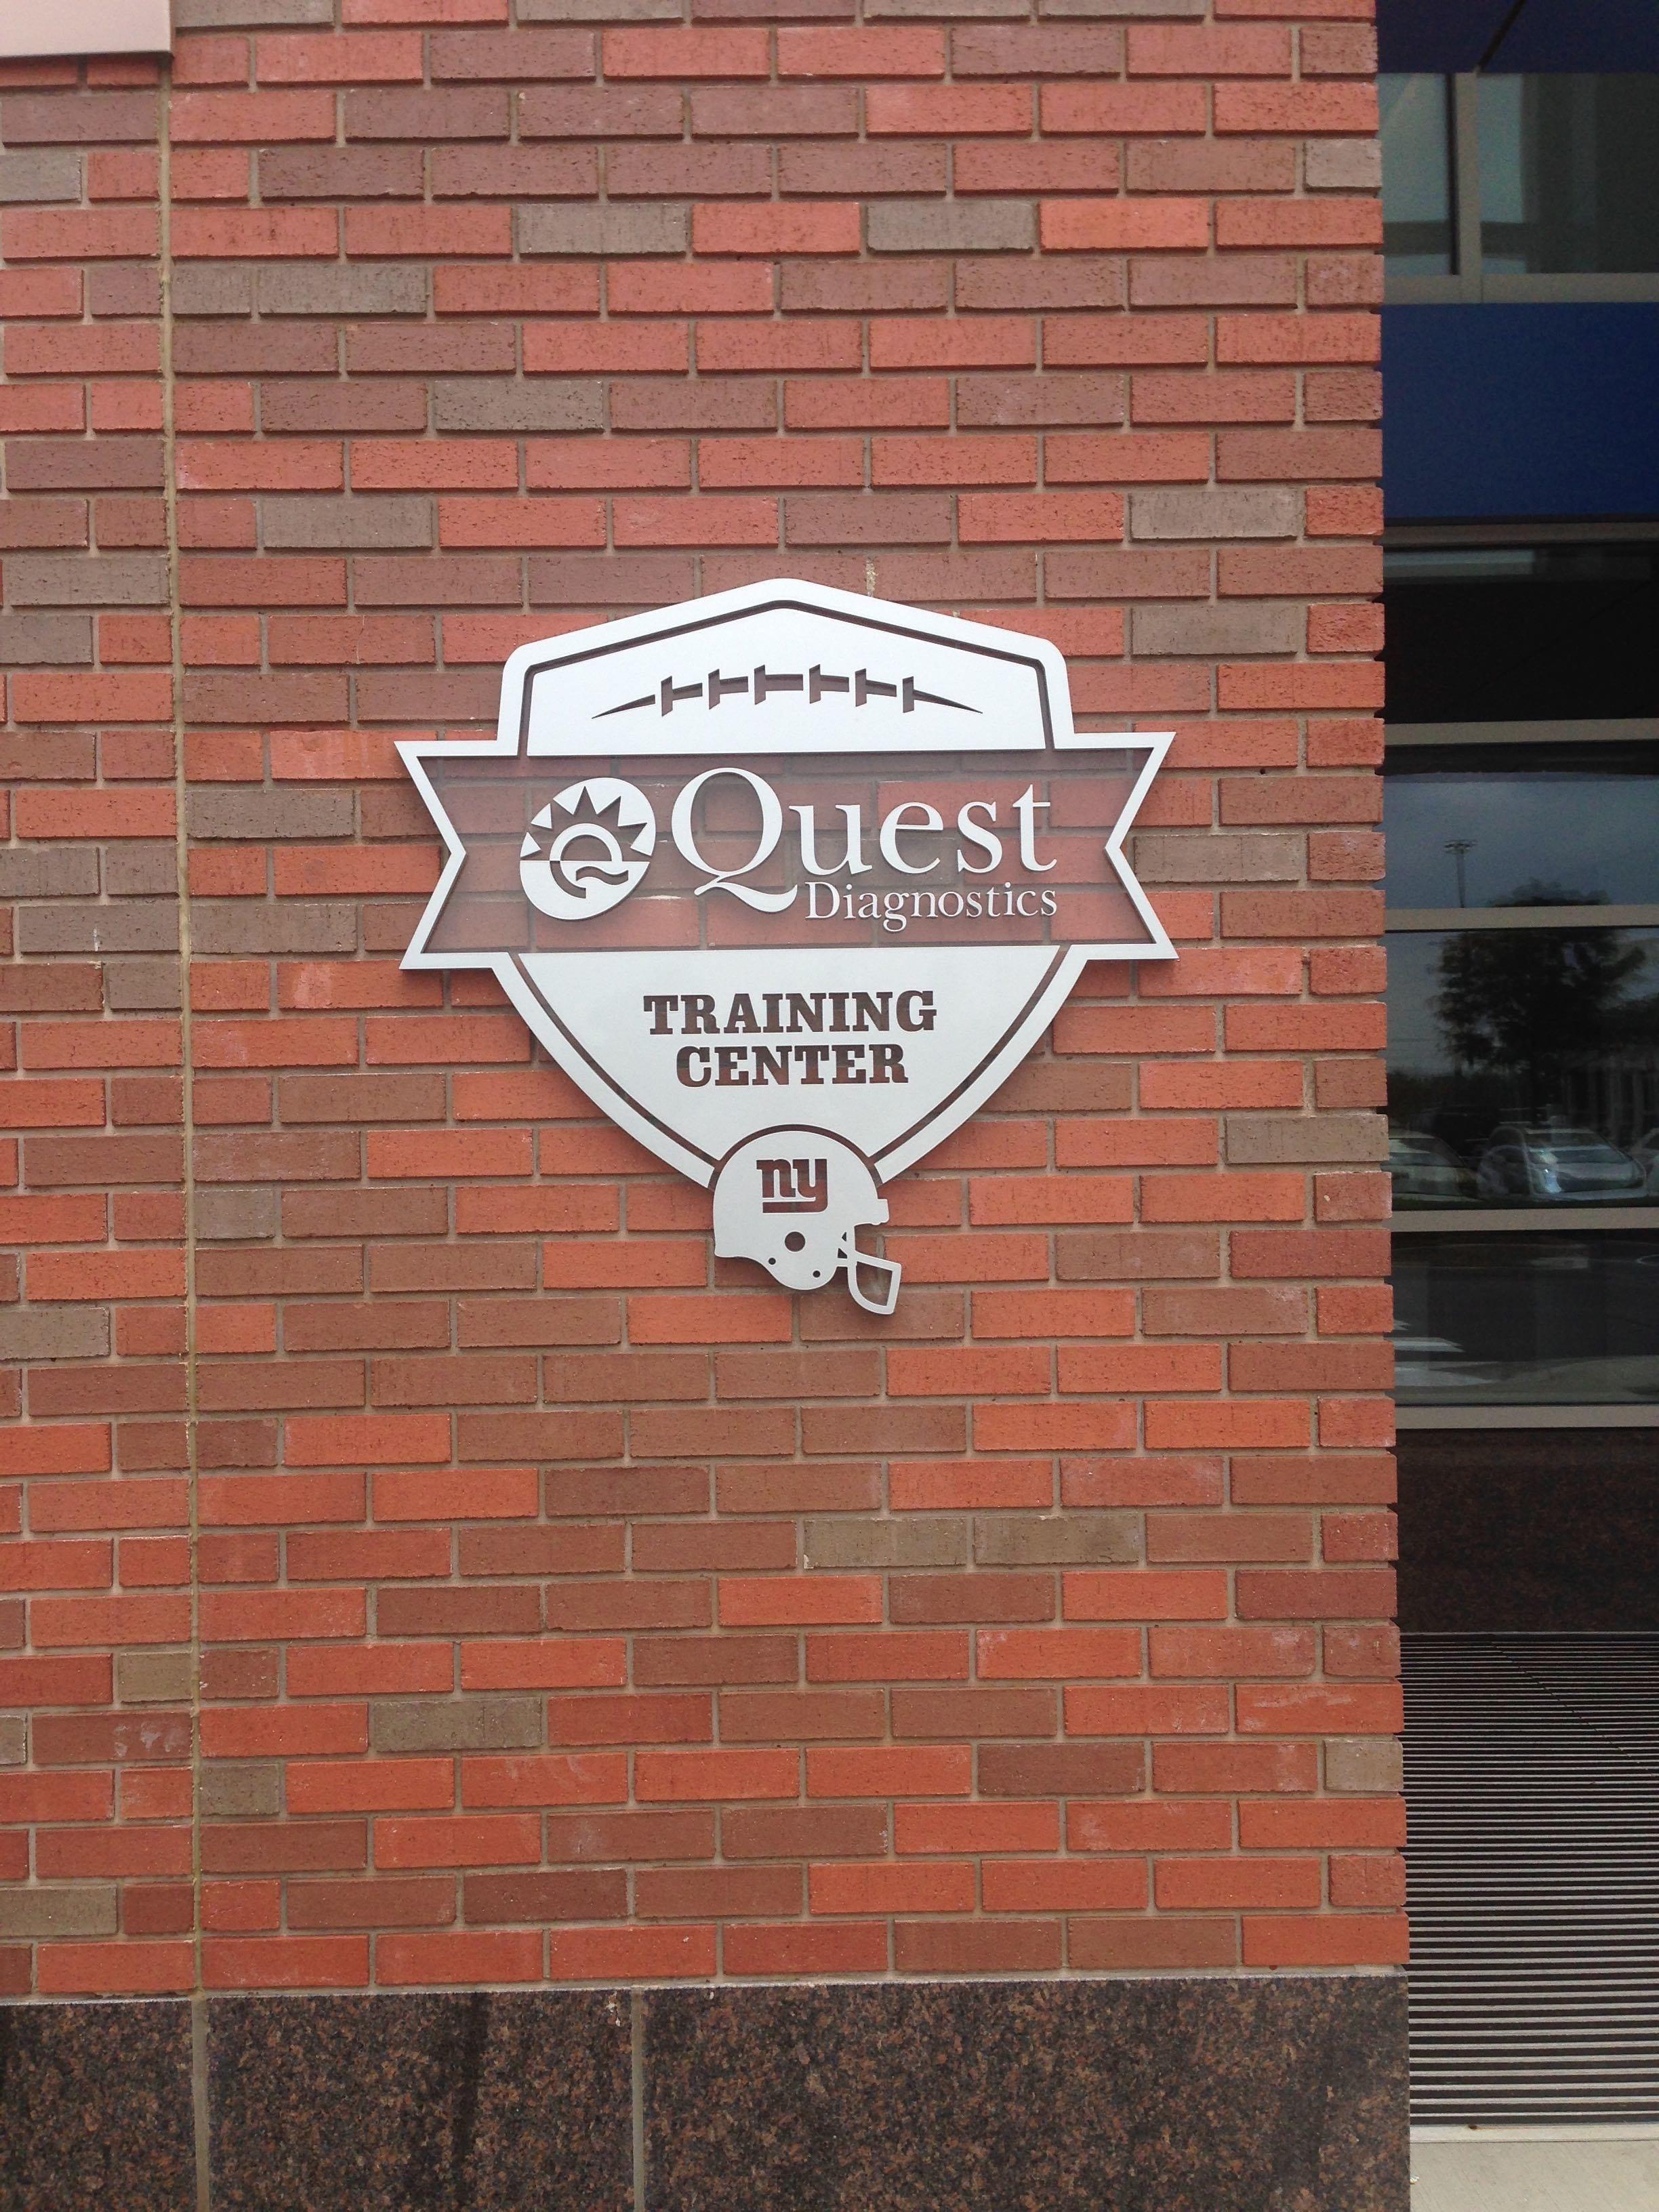 New York Giants, Quest Diagnostics training center